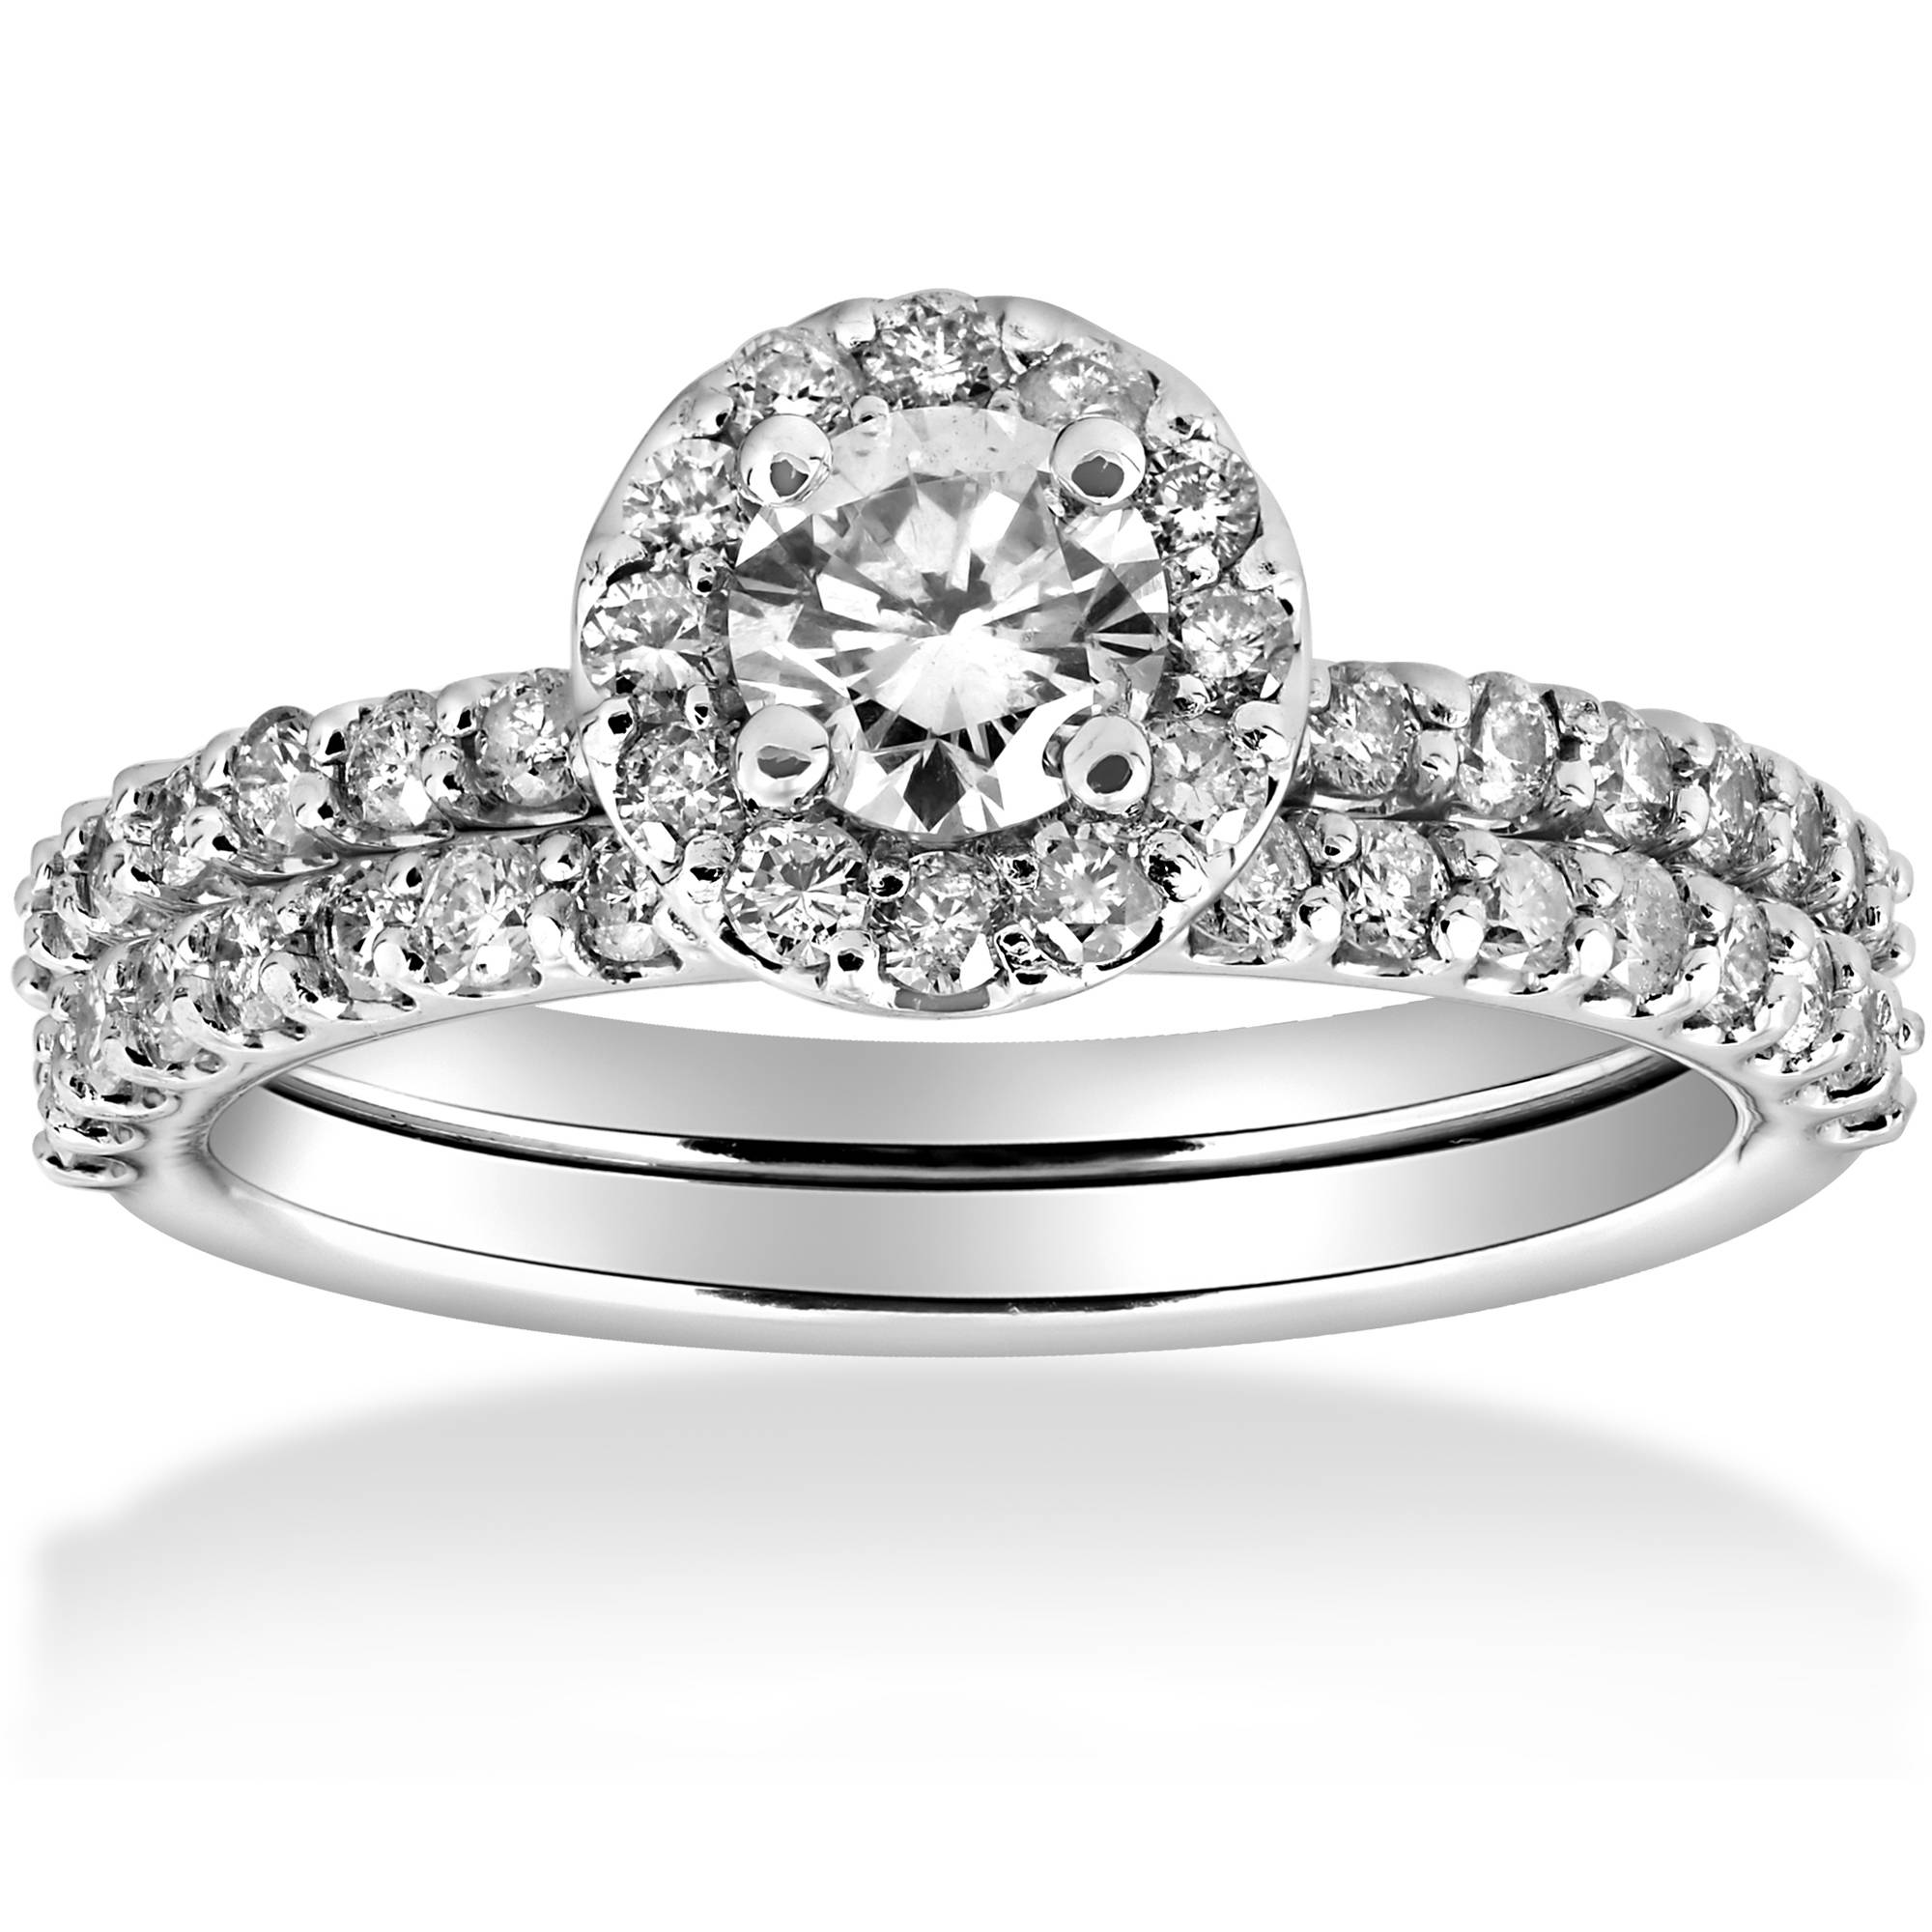 1 cttw Diamond Round Halo Solitaire Engagement Wedding ...